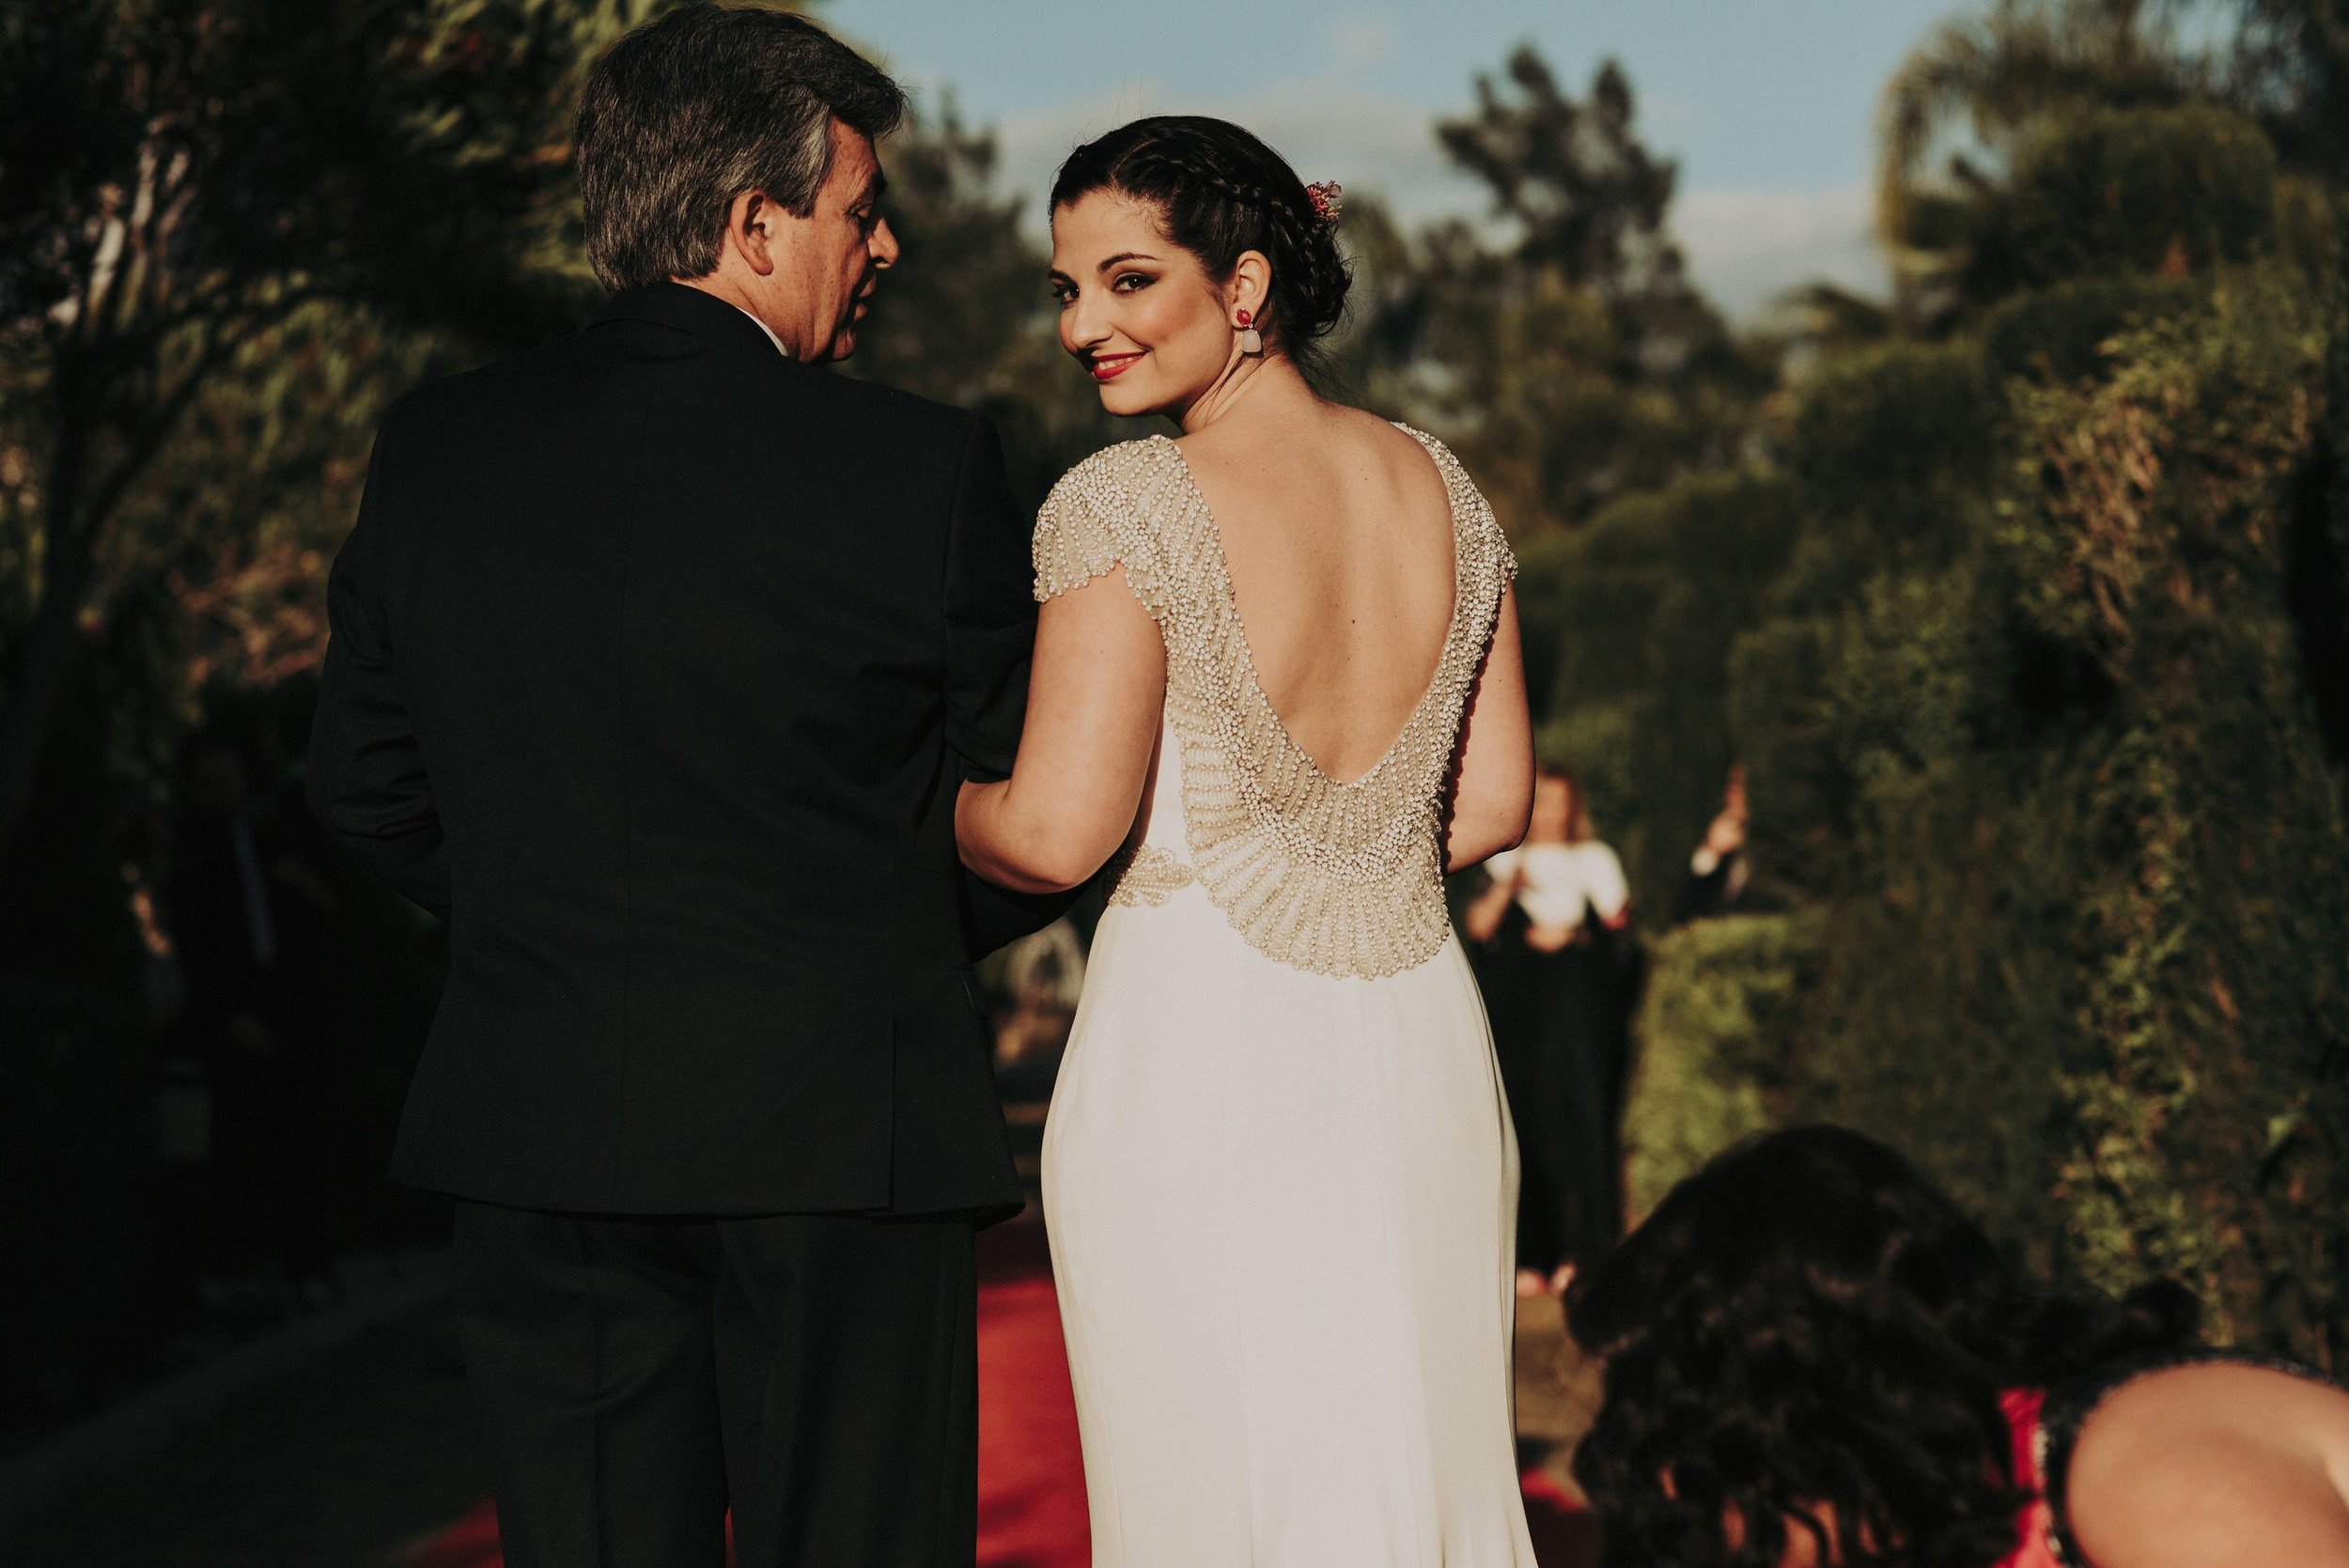 Laura & Rubén - boda en utrera - Santa clotilde- Manolo mayo - Fotografo de boda - Andrés Amarillo AAA_1075-Exposure (74).jpg